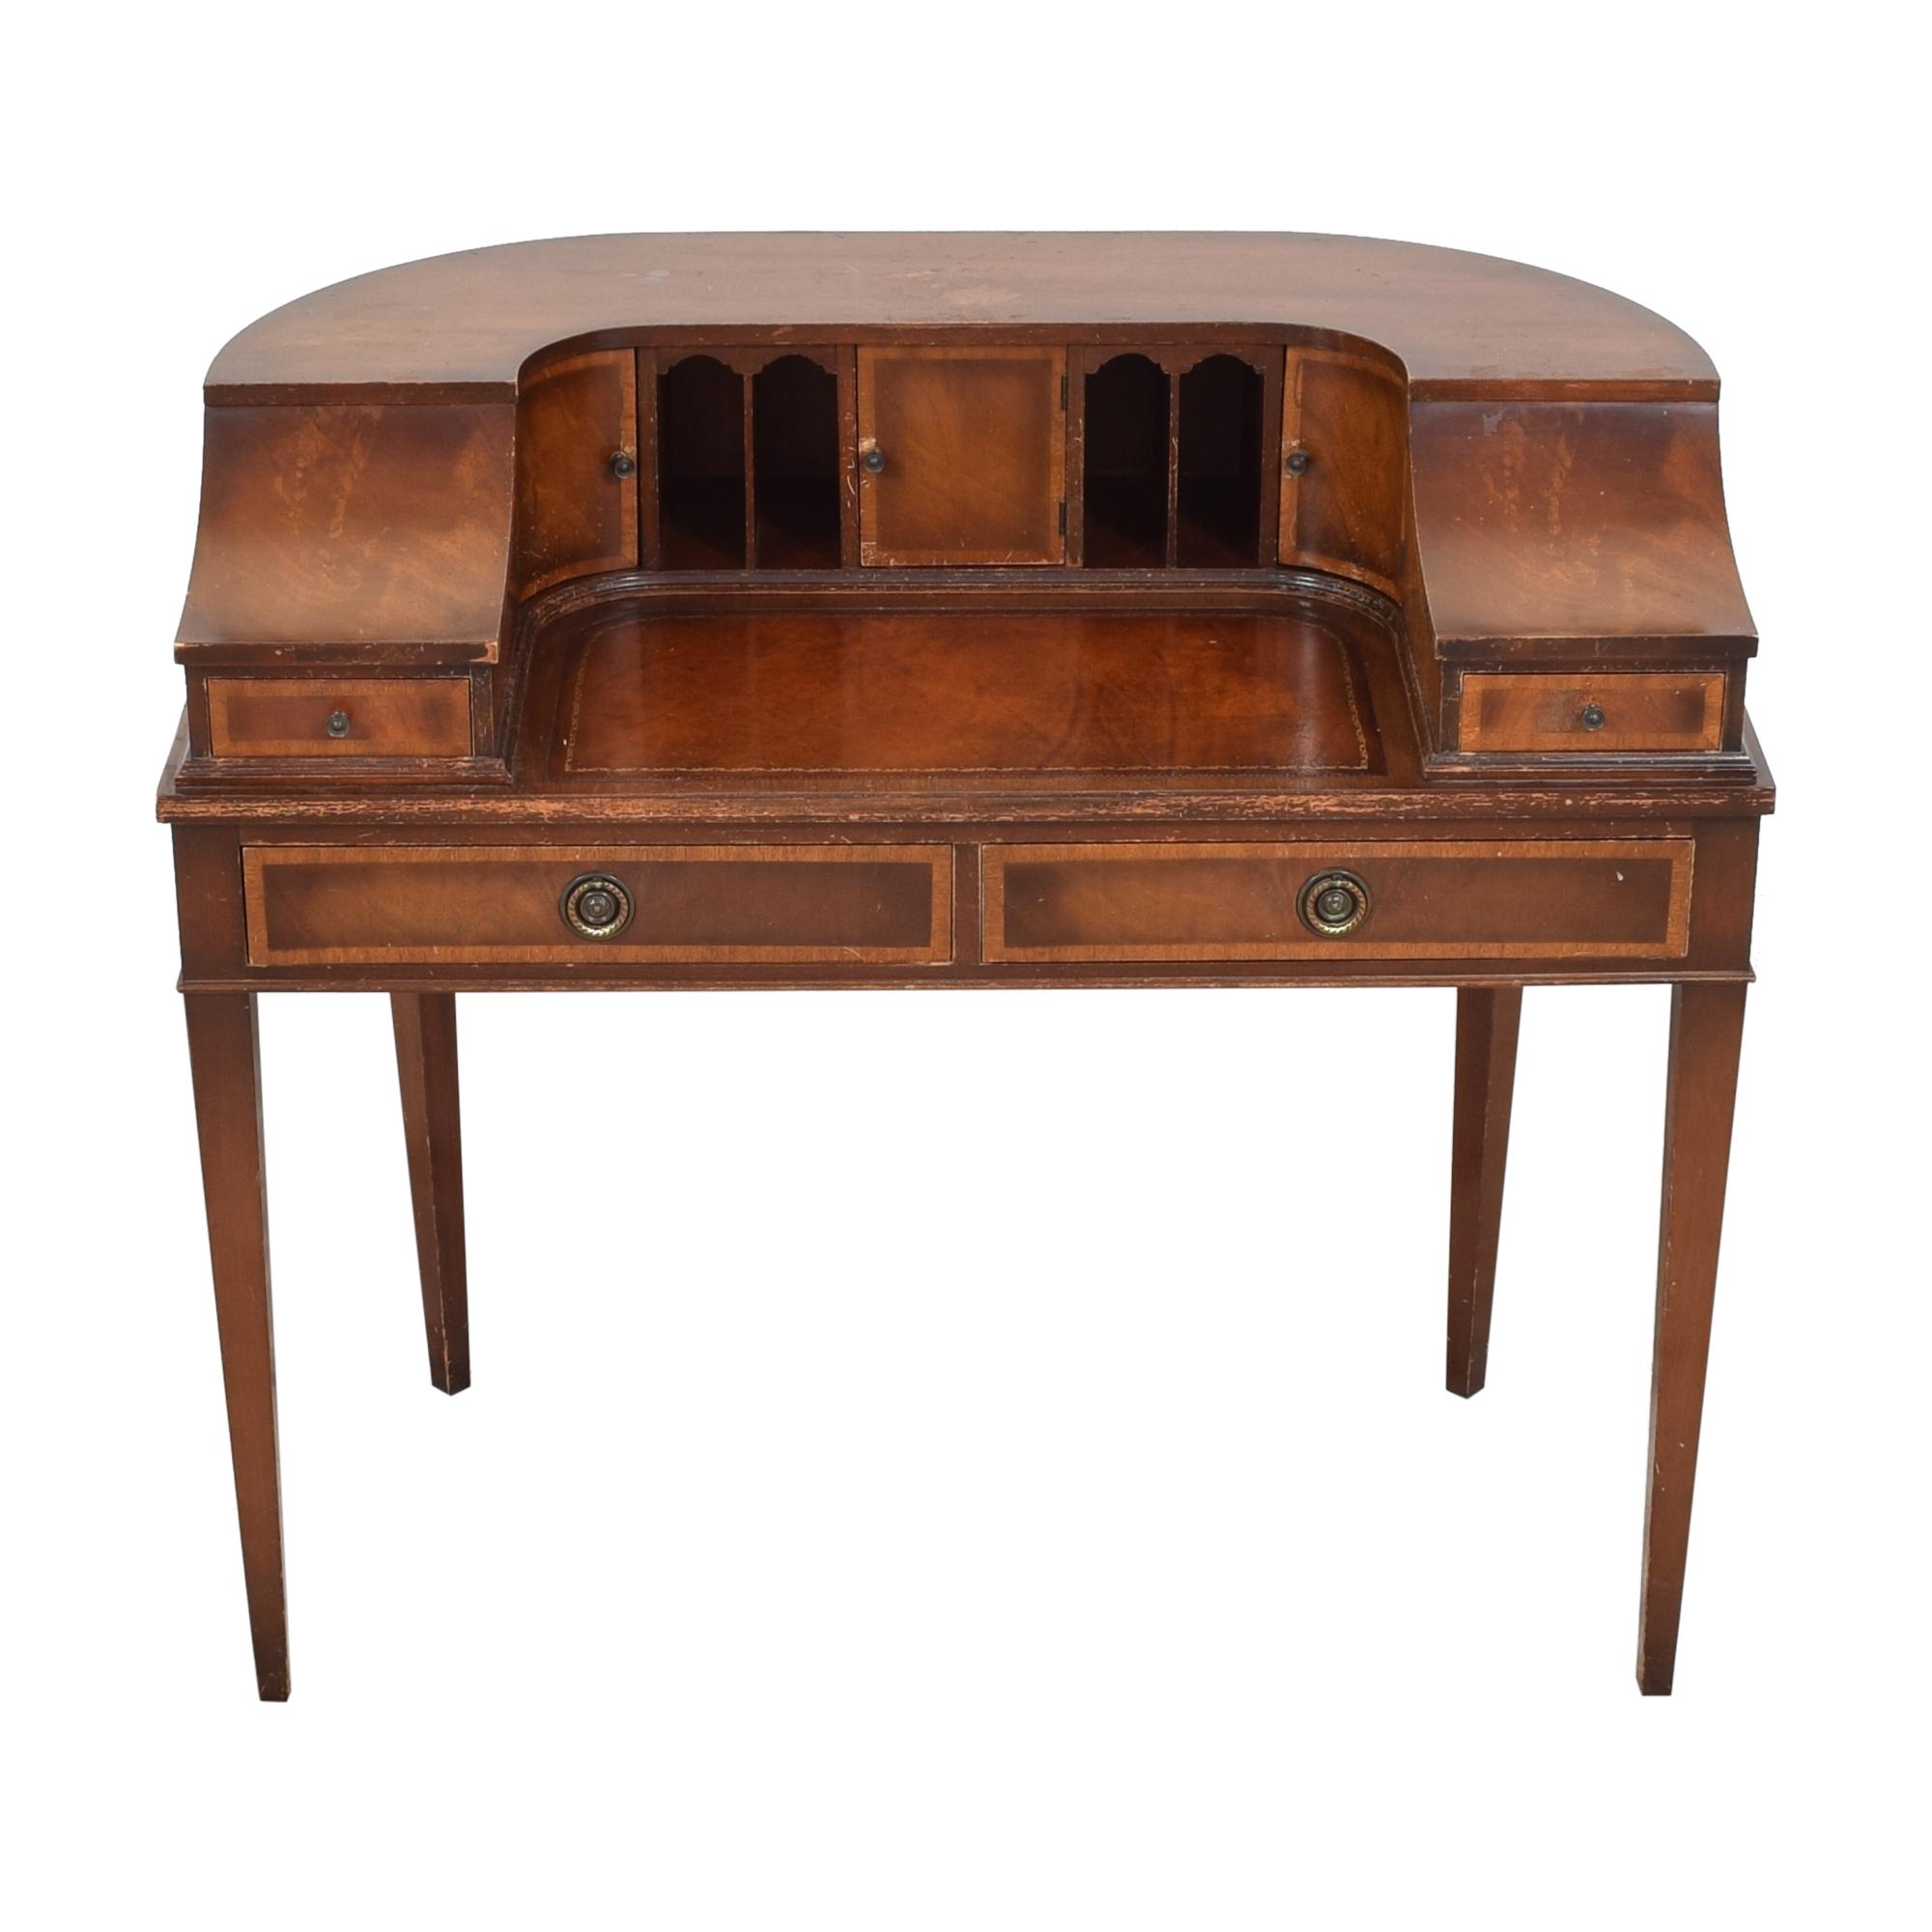 Stiehl Furniture Stiehl Furniture Mahogany Secretary Desk nj